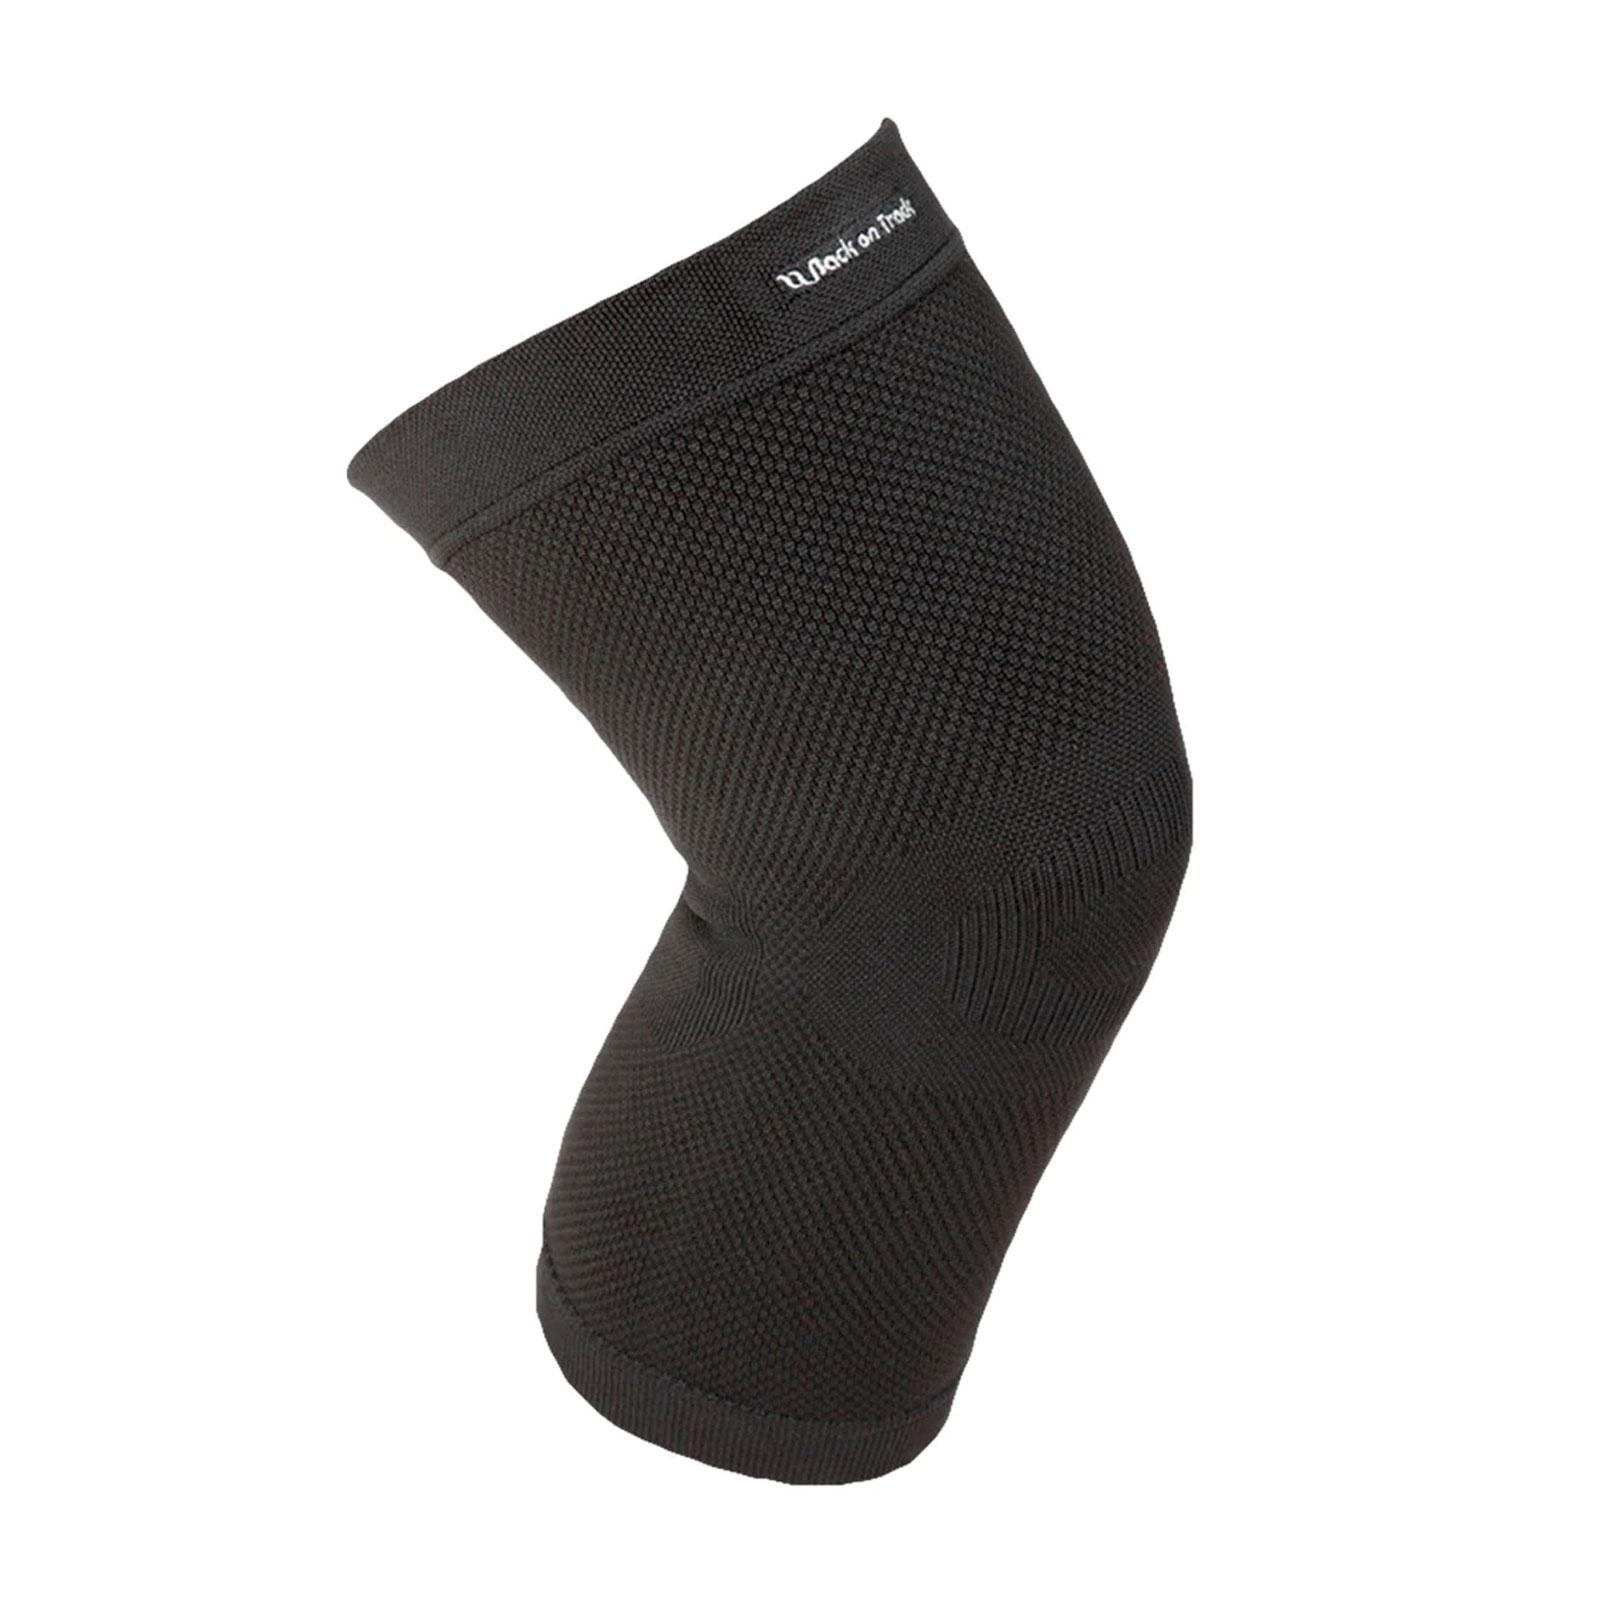 BACK ON TRACK Black Physio Knee Brace (110700)